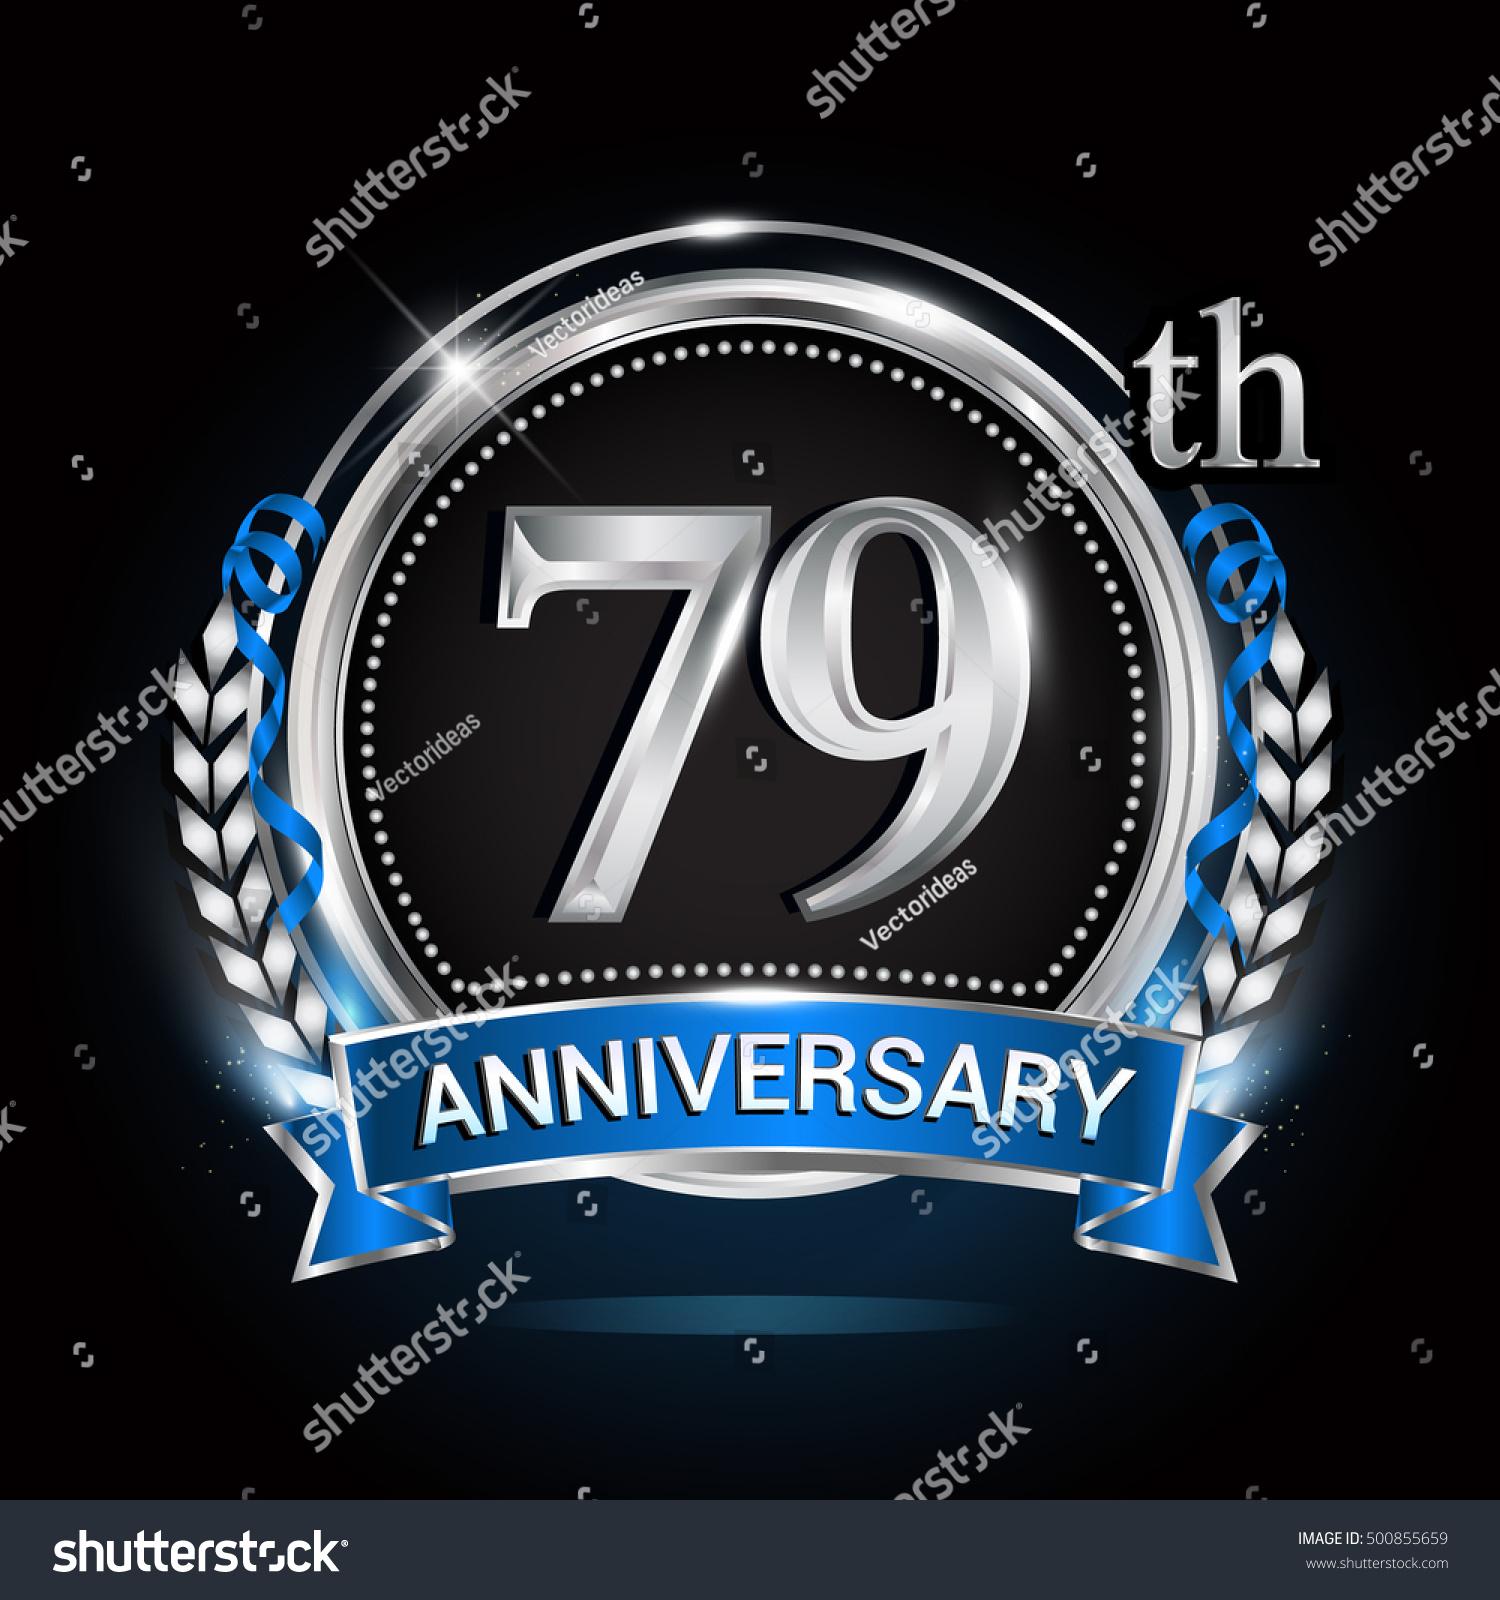 79th Silver Anniversary Logo Laurel Wreath Stock Vector 500855659 - Shutterstock